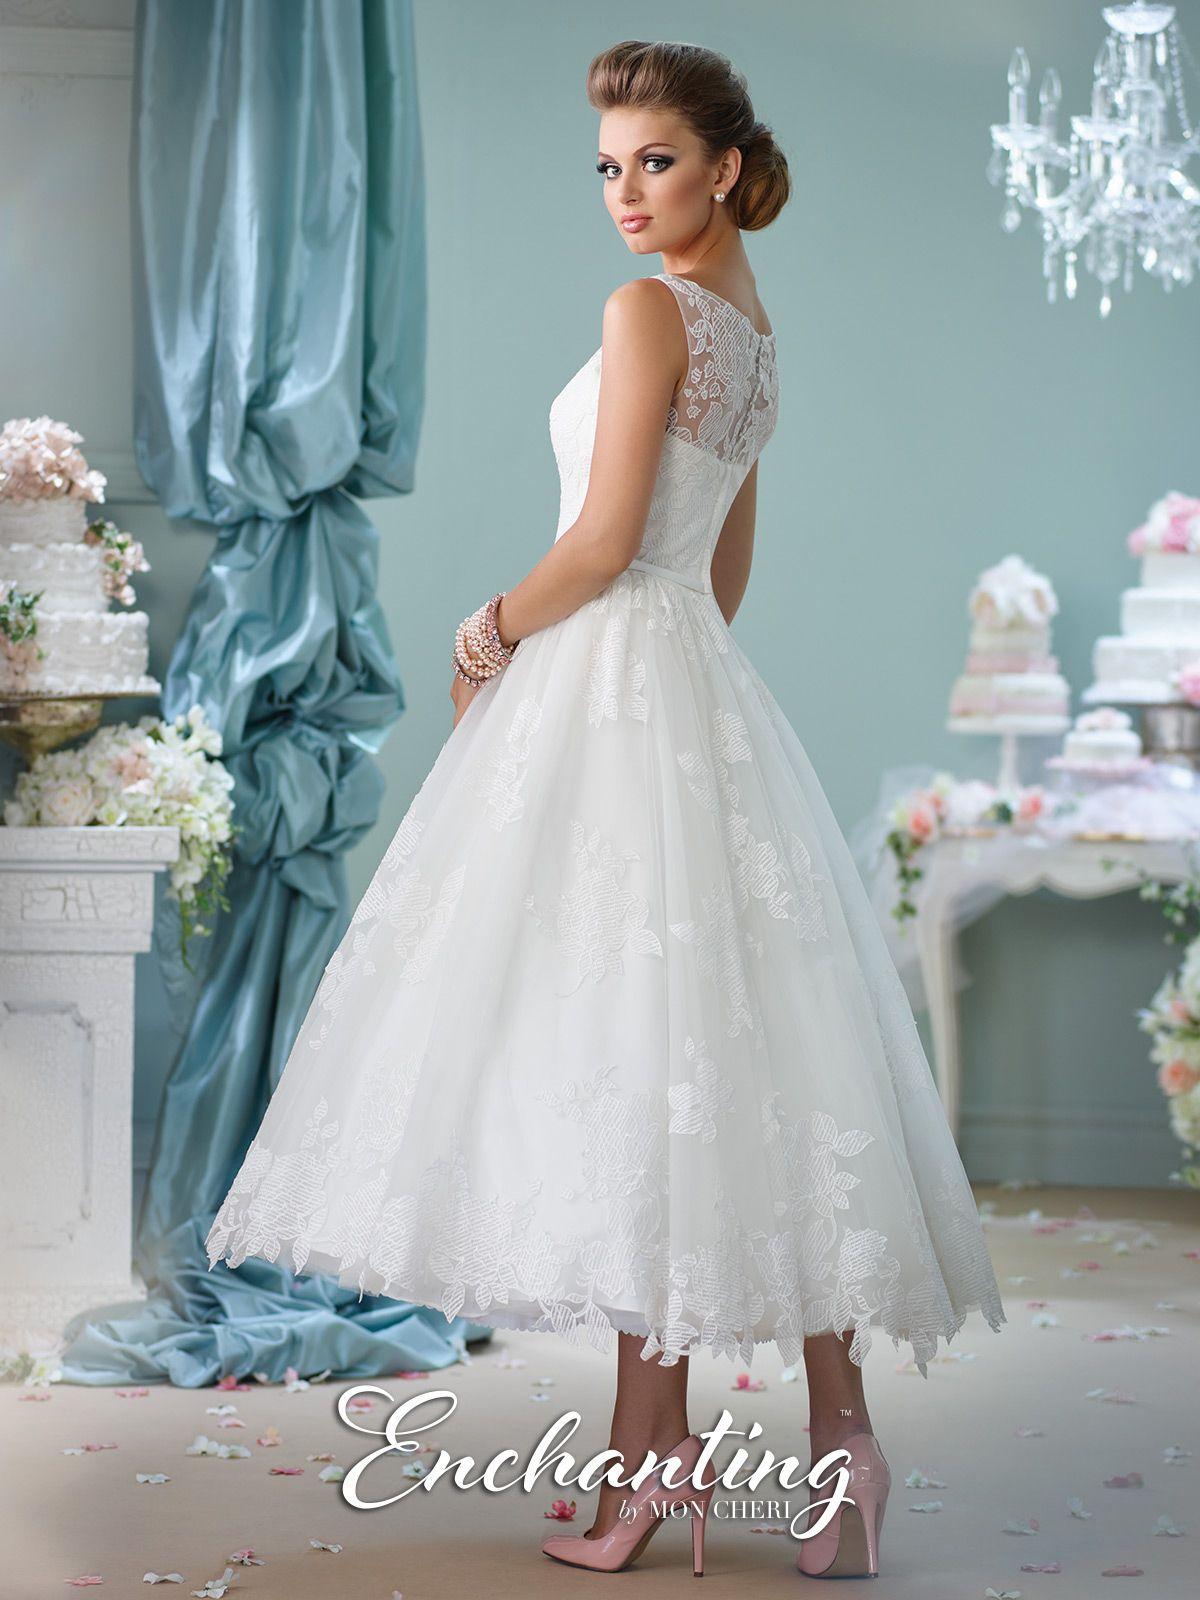 Tea Length Wedding Dress- 116136- Enchanting by Mon Cheri   Hochzeit